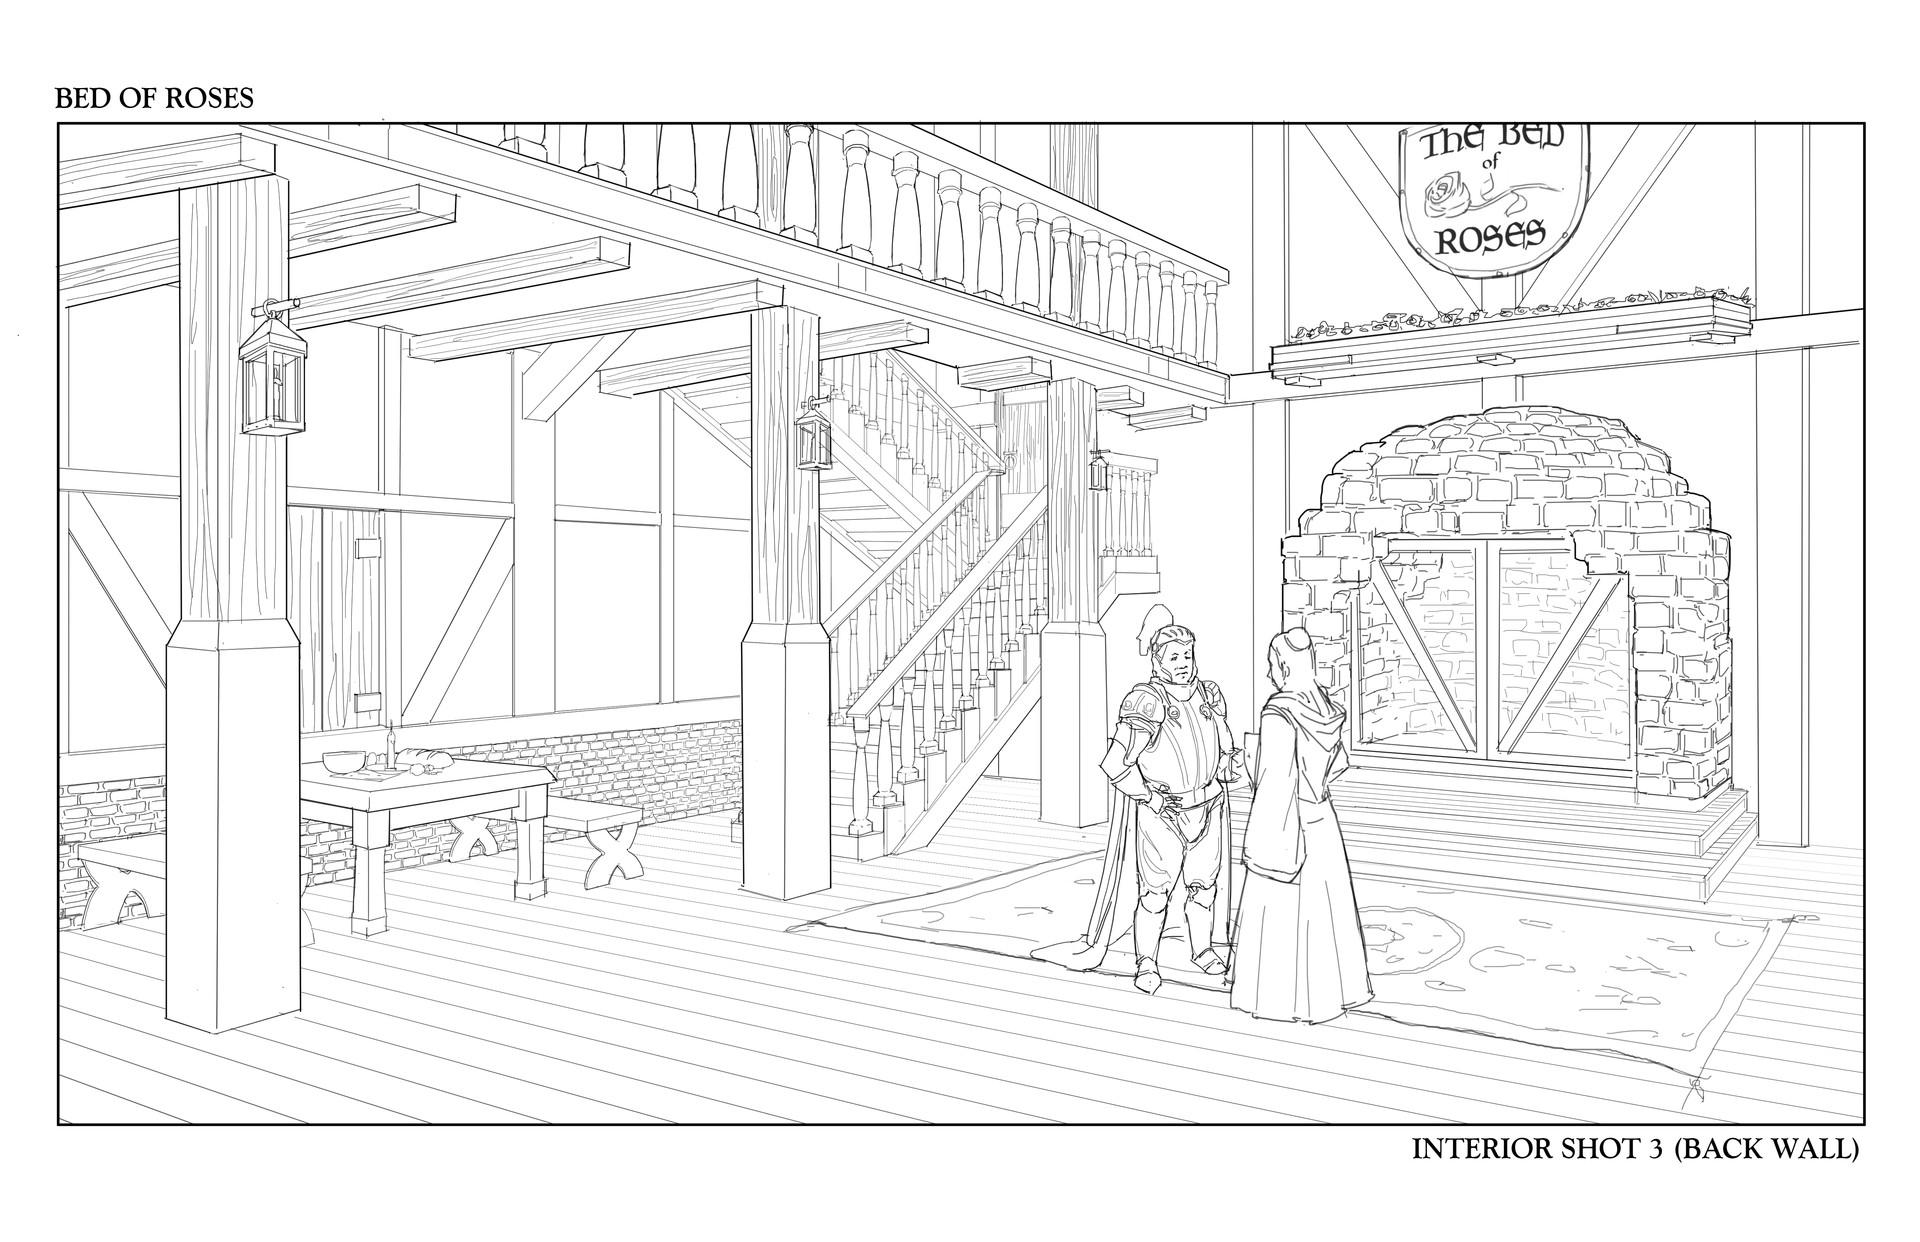 paul-chang-weldon-sketches-interior-shot-3.jpg